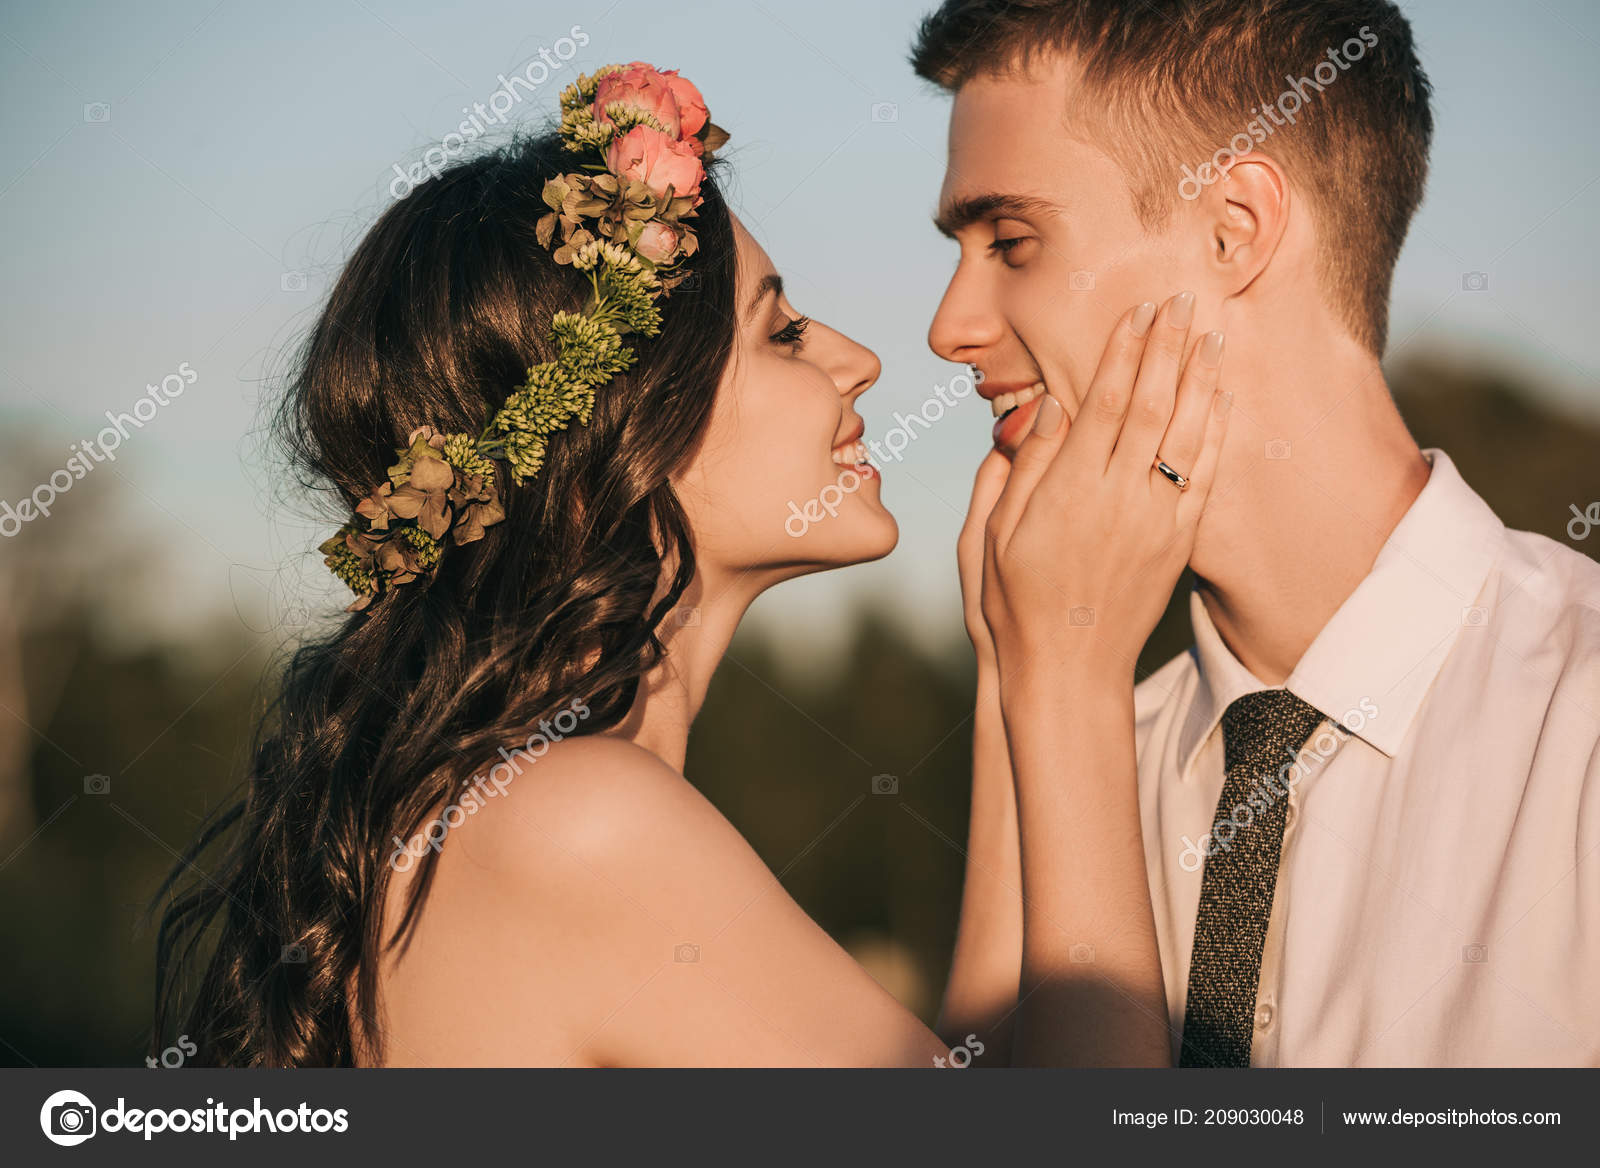 Side View Beautiful Happy Young Wedding Couple Kissing Park Stock Photo by ©IgorVetushko 209030048